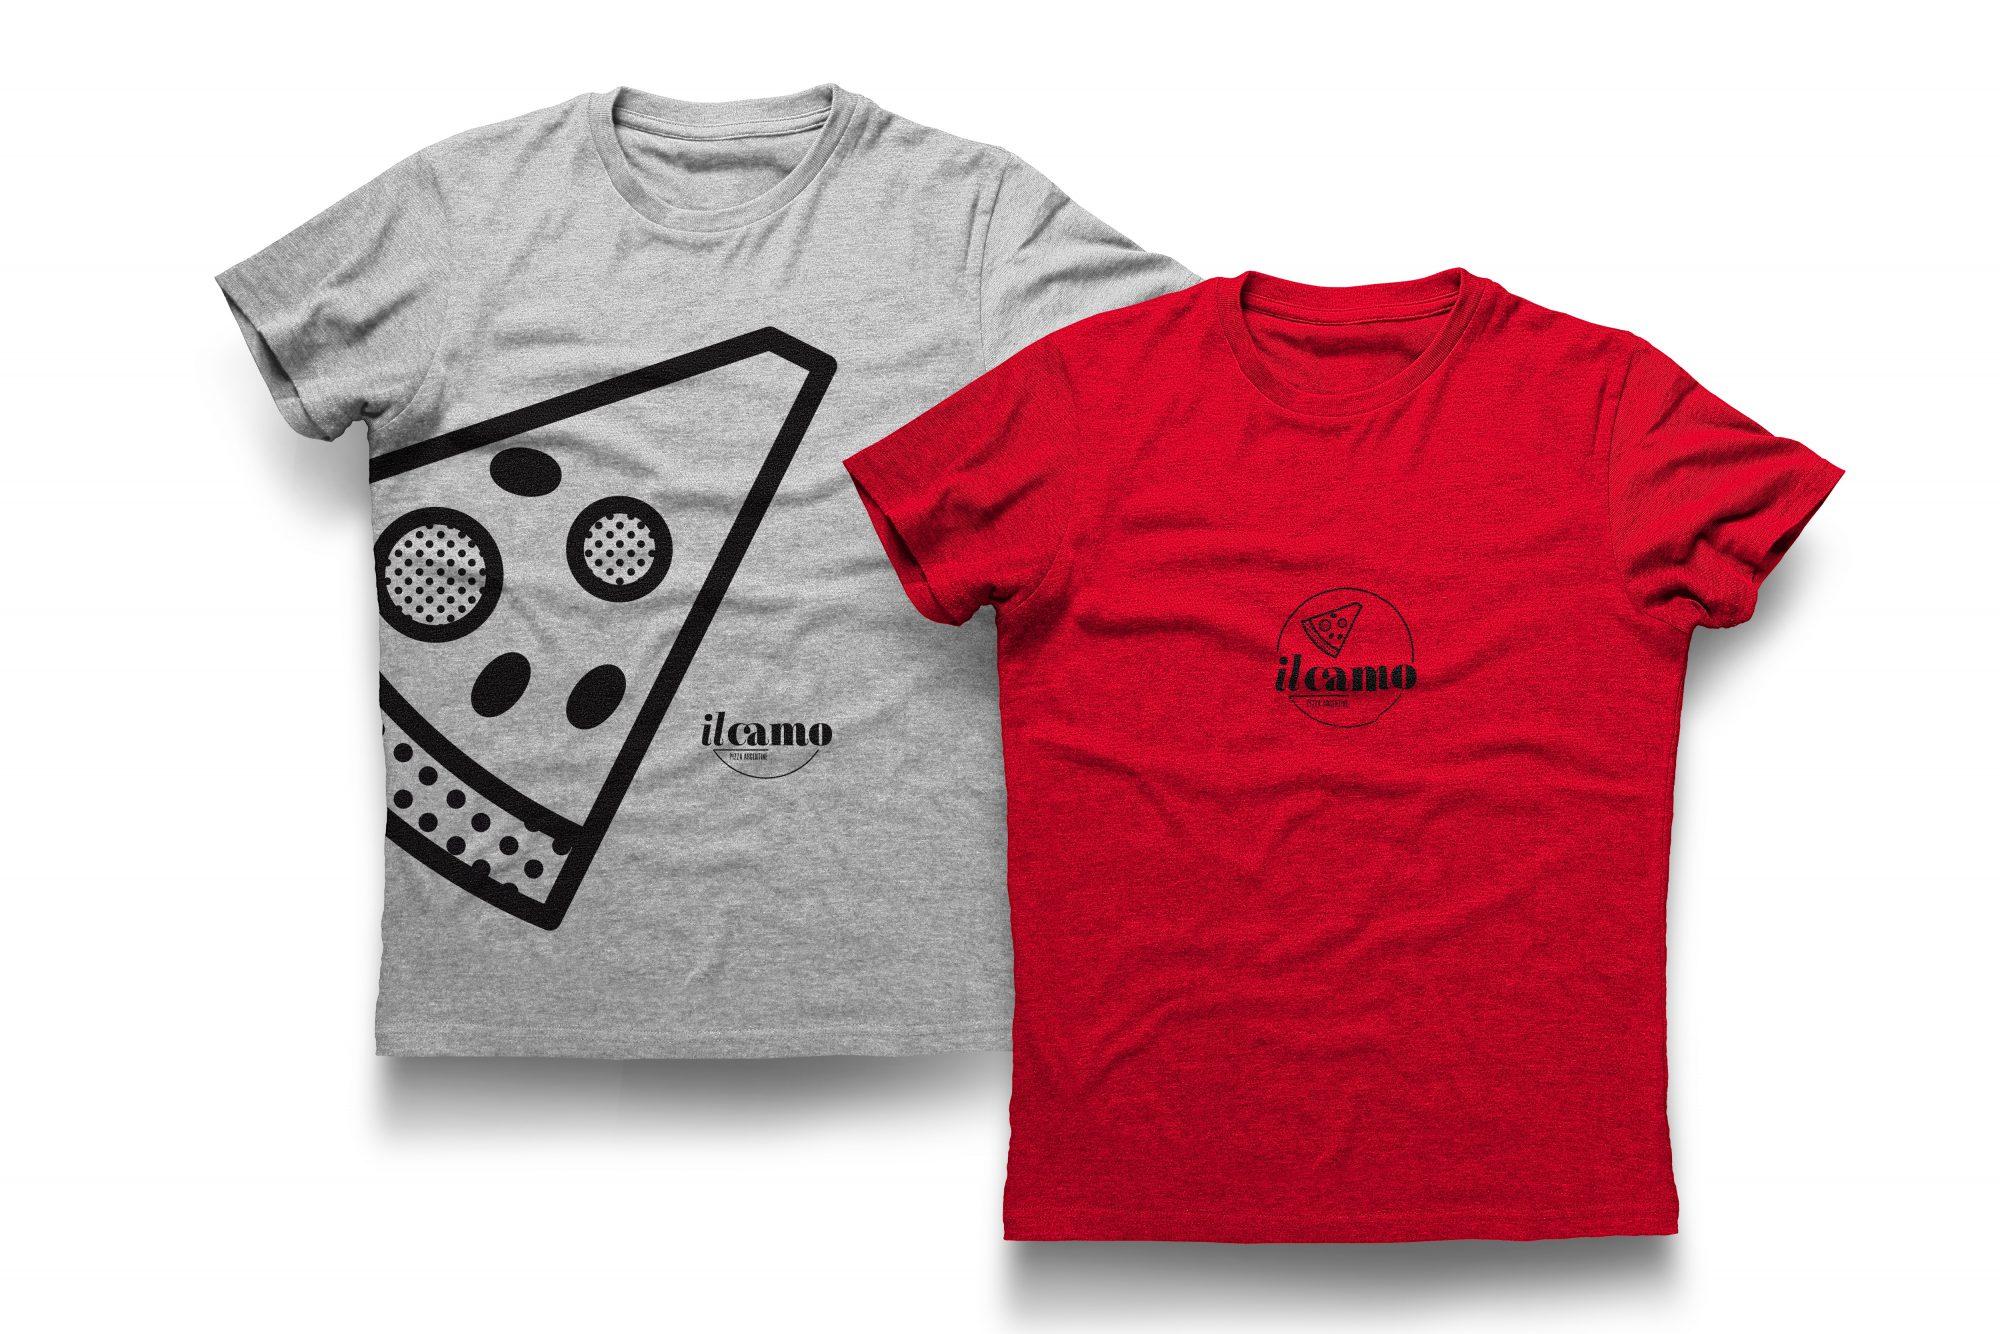 il camo – shirt mockup2